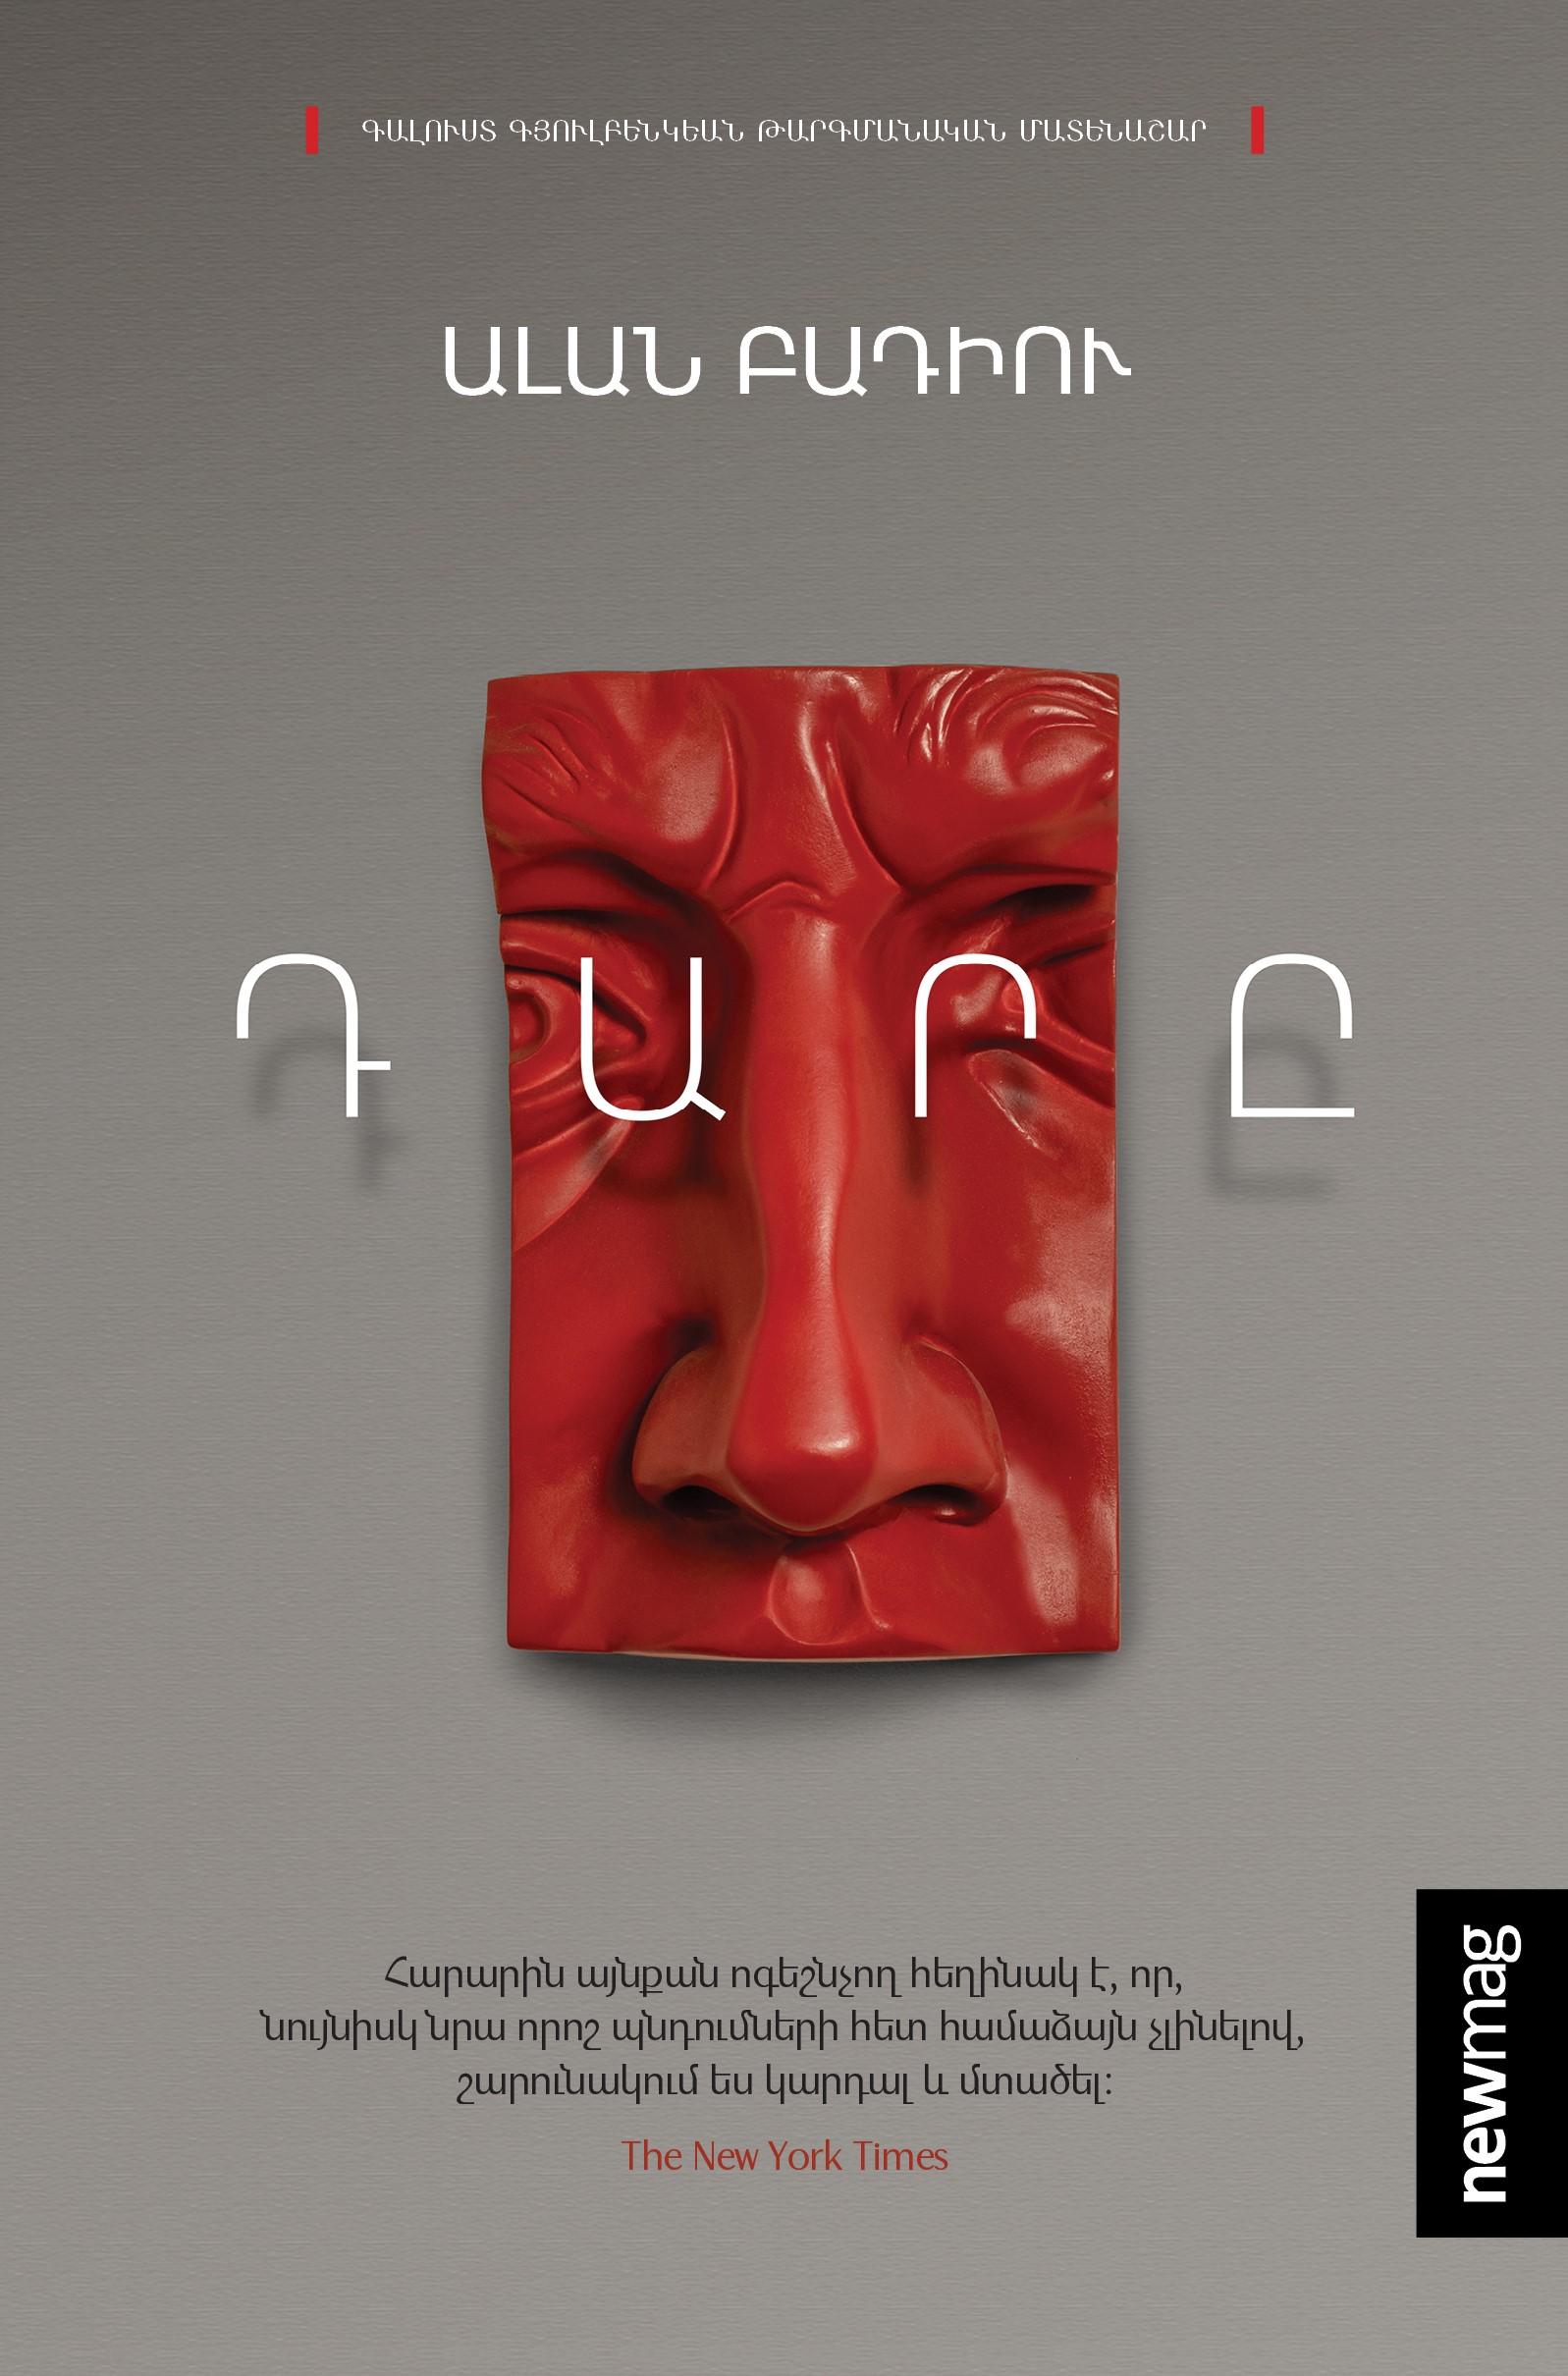 """The Century"" by Alain Badiou released in Calouste Gulbenkian Translation Series"